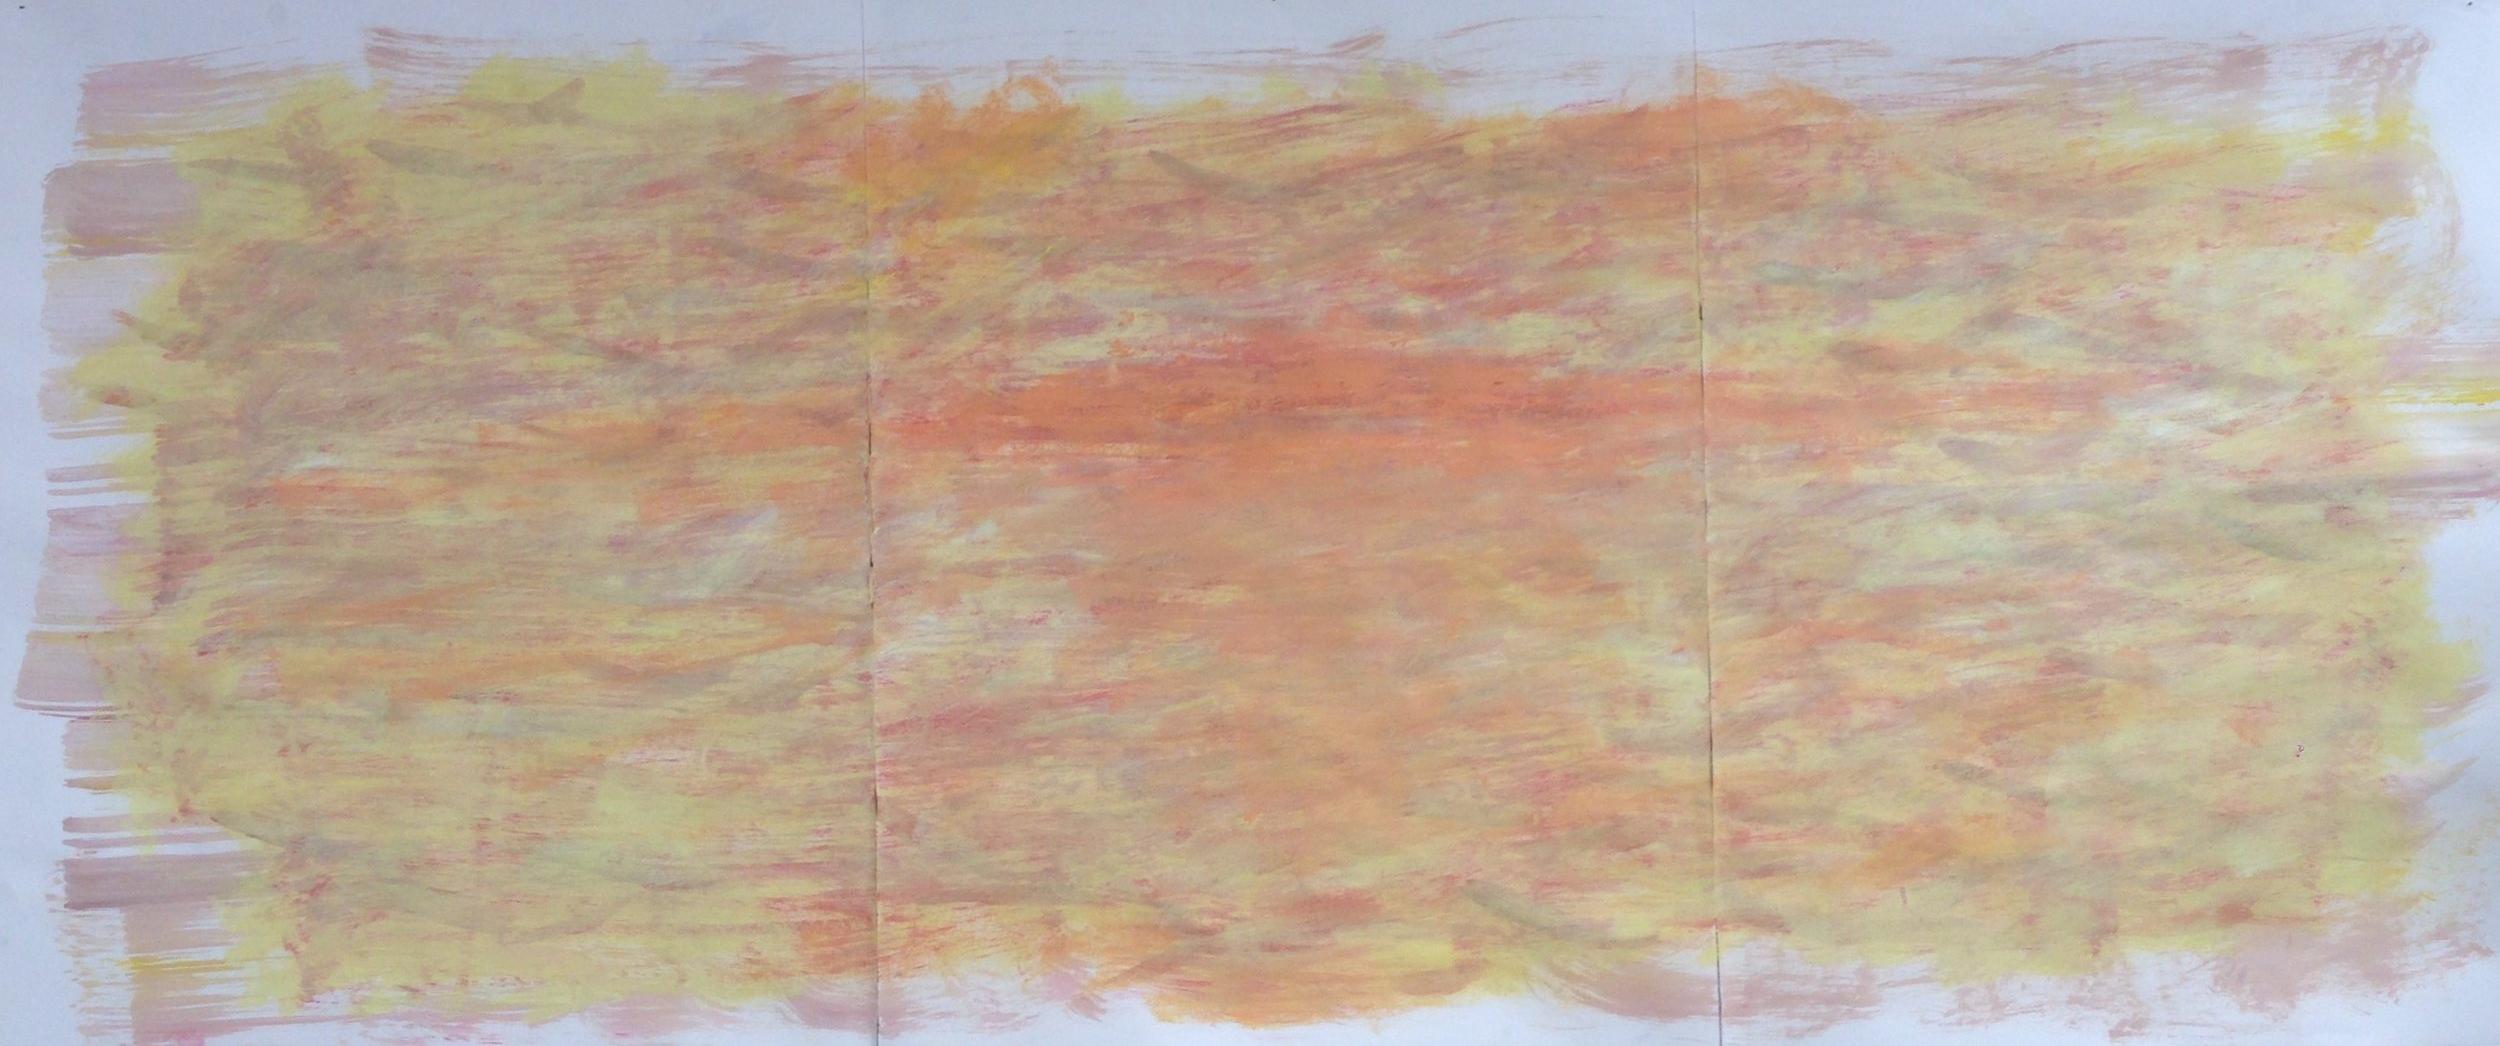 "Sunset Feeling Inside  - $200 (mixed media on paper, 54"" x 24"")"